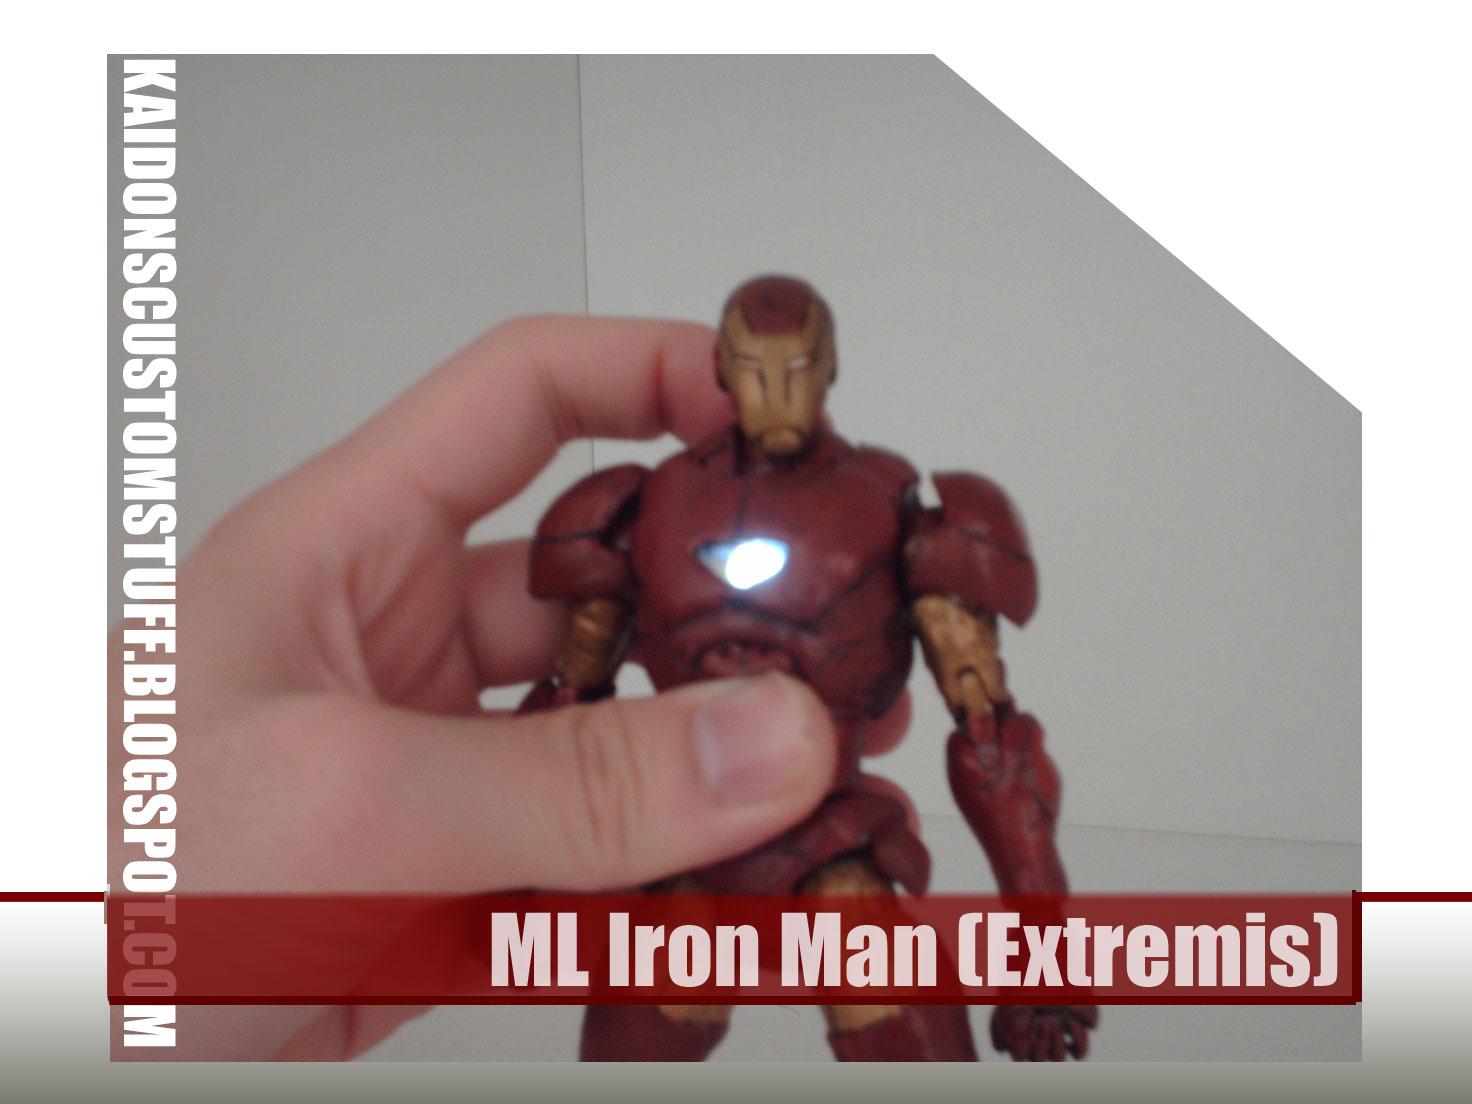 http://3.bp.blogspot.com/_NydzcGVJtdA/TObictbRkxI/AAAAAAAAATQ/vZiCHyM40Qo/s1600/ML-Iron-Man-Extremis-08.jpg